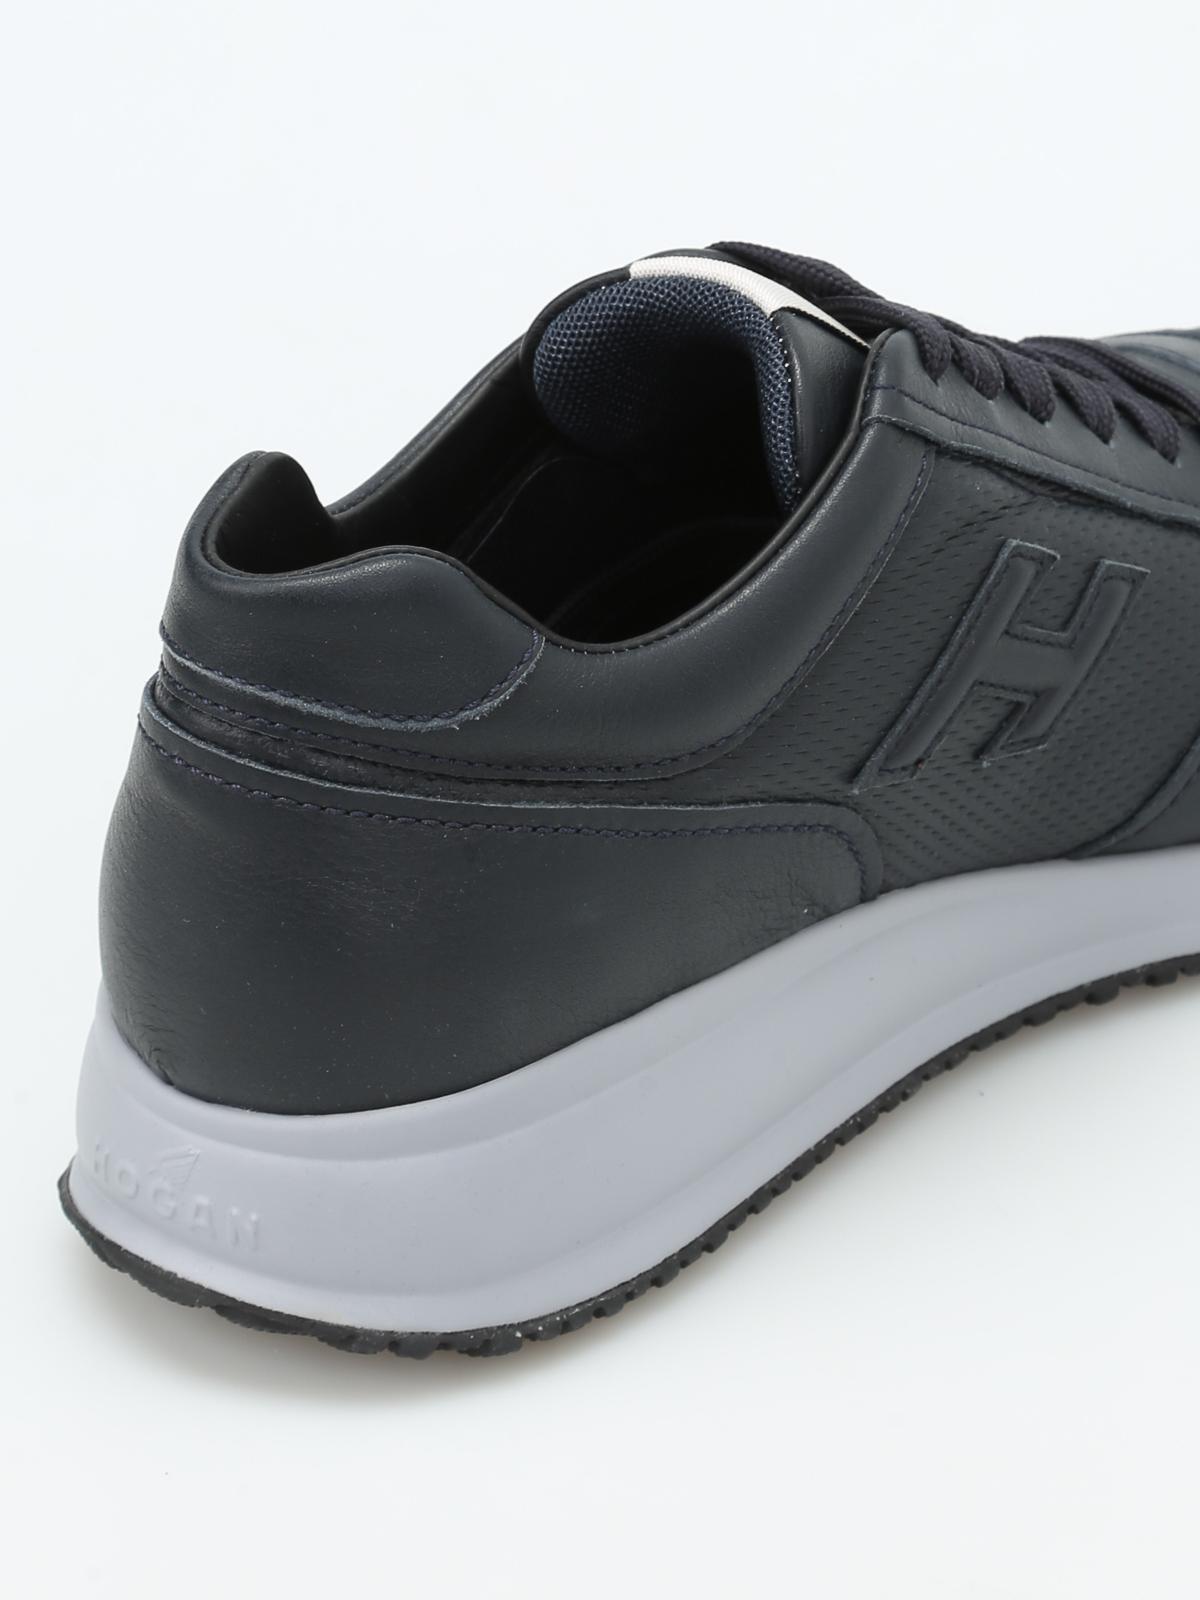 Trainers Hogan - Interactive N20 leather sneakers - HXM2460T790BTLU805